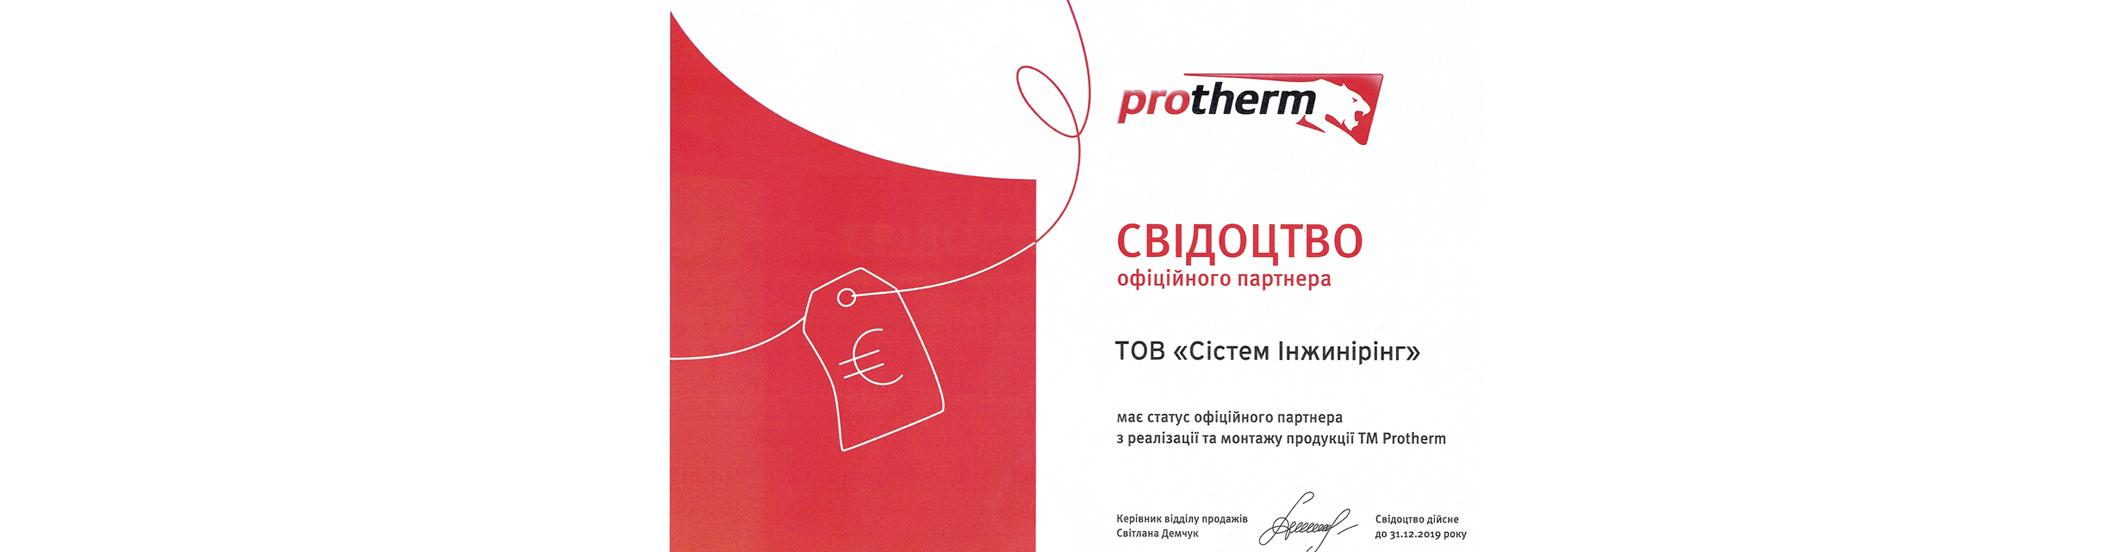 Сервисное обслуживание ТМ Protherm - Systems Engineering